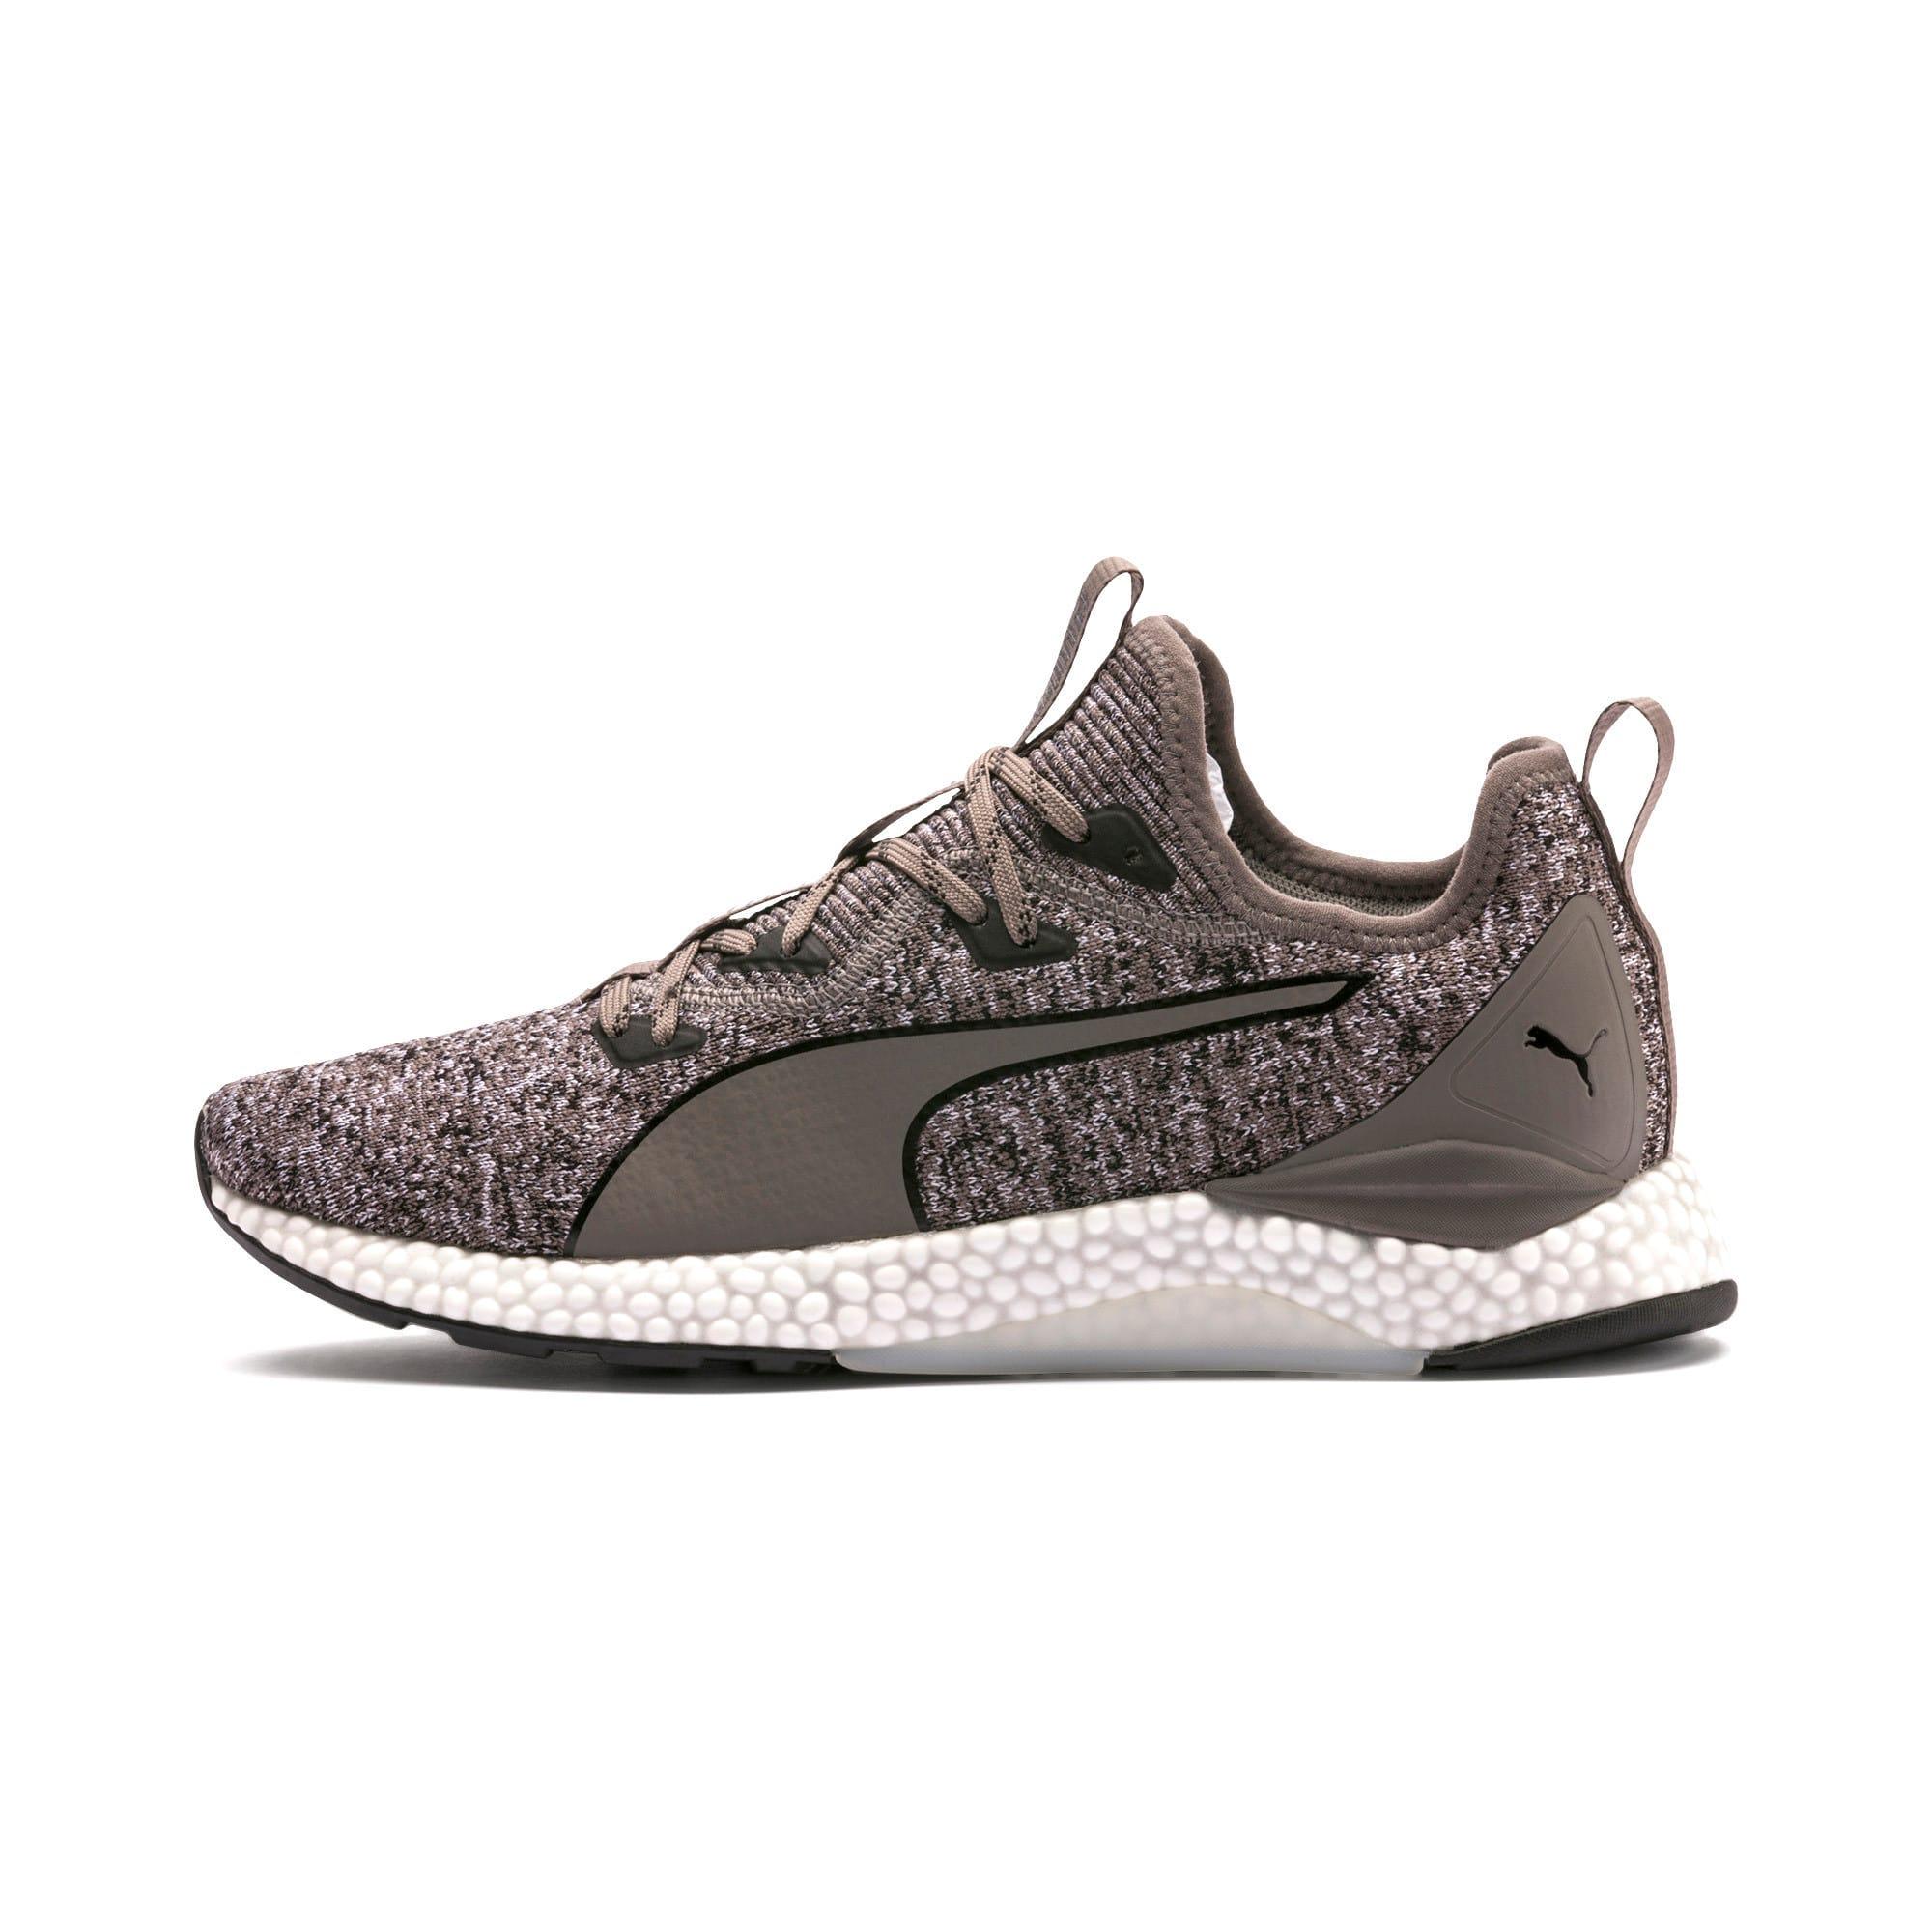 Thumbnail 1 of Hybrid Runner Men's Running Shoes, Charcoal Gray-Puma White, medium-IND